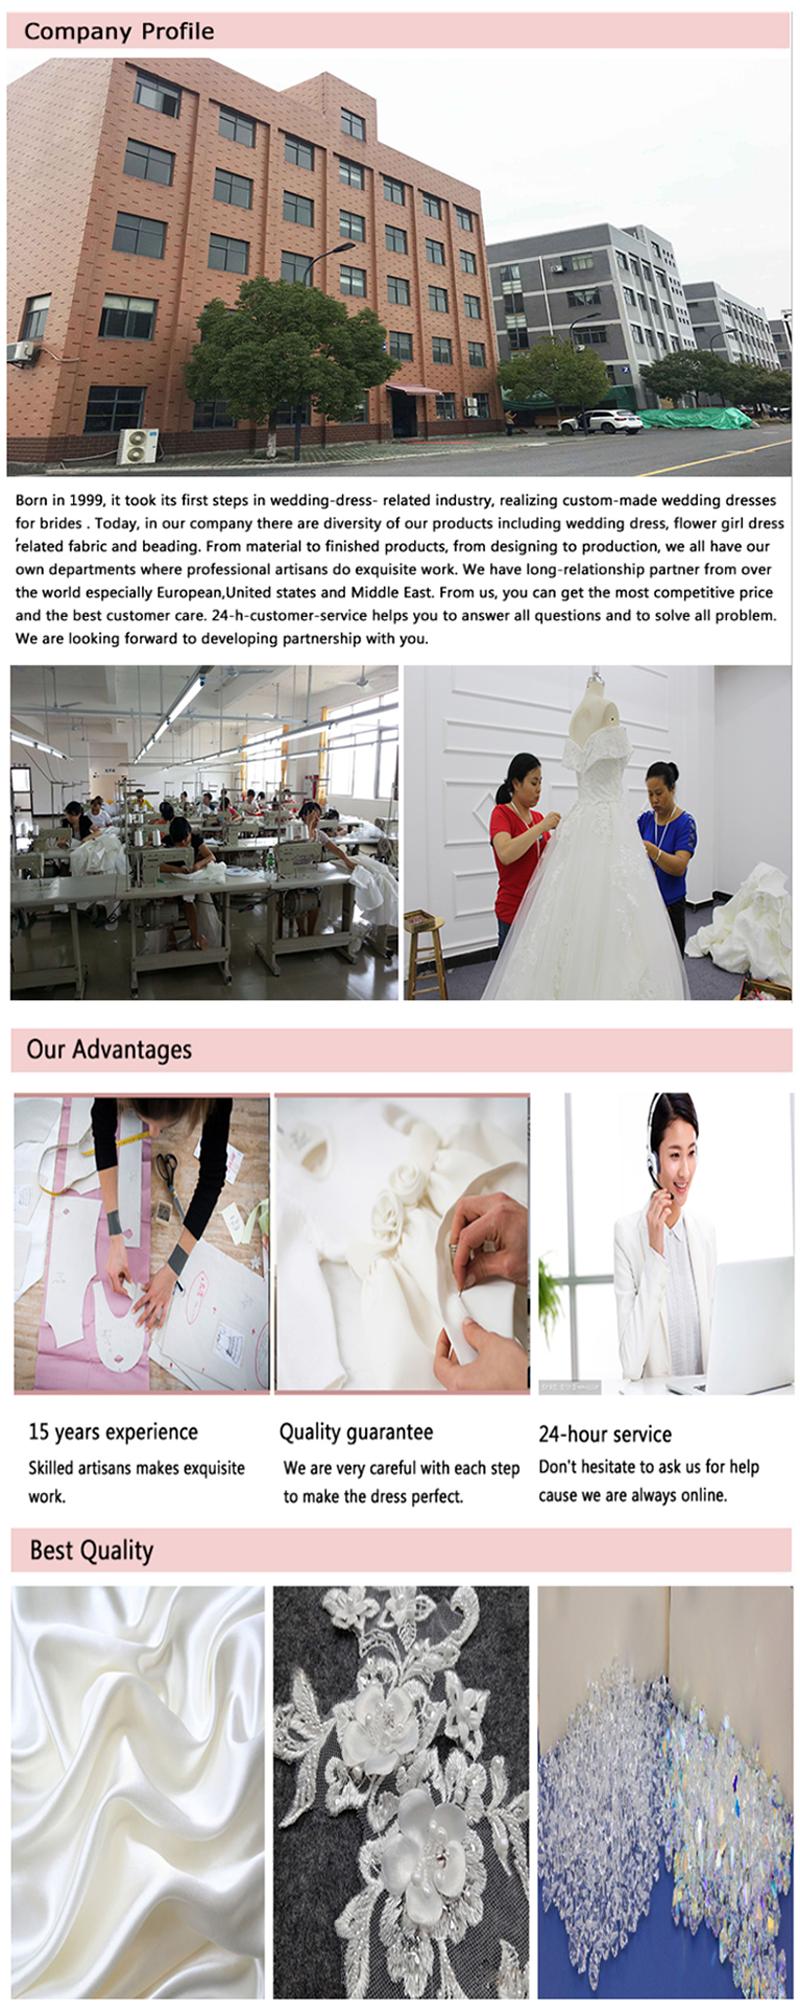 Eslieb 2019 Luxe Bridal Veils 3.5 meters Lange Lace Edge Applicaties Bedekt Gezicht Laag Afgeronde Groothandel Prijs Sluier met Kam